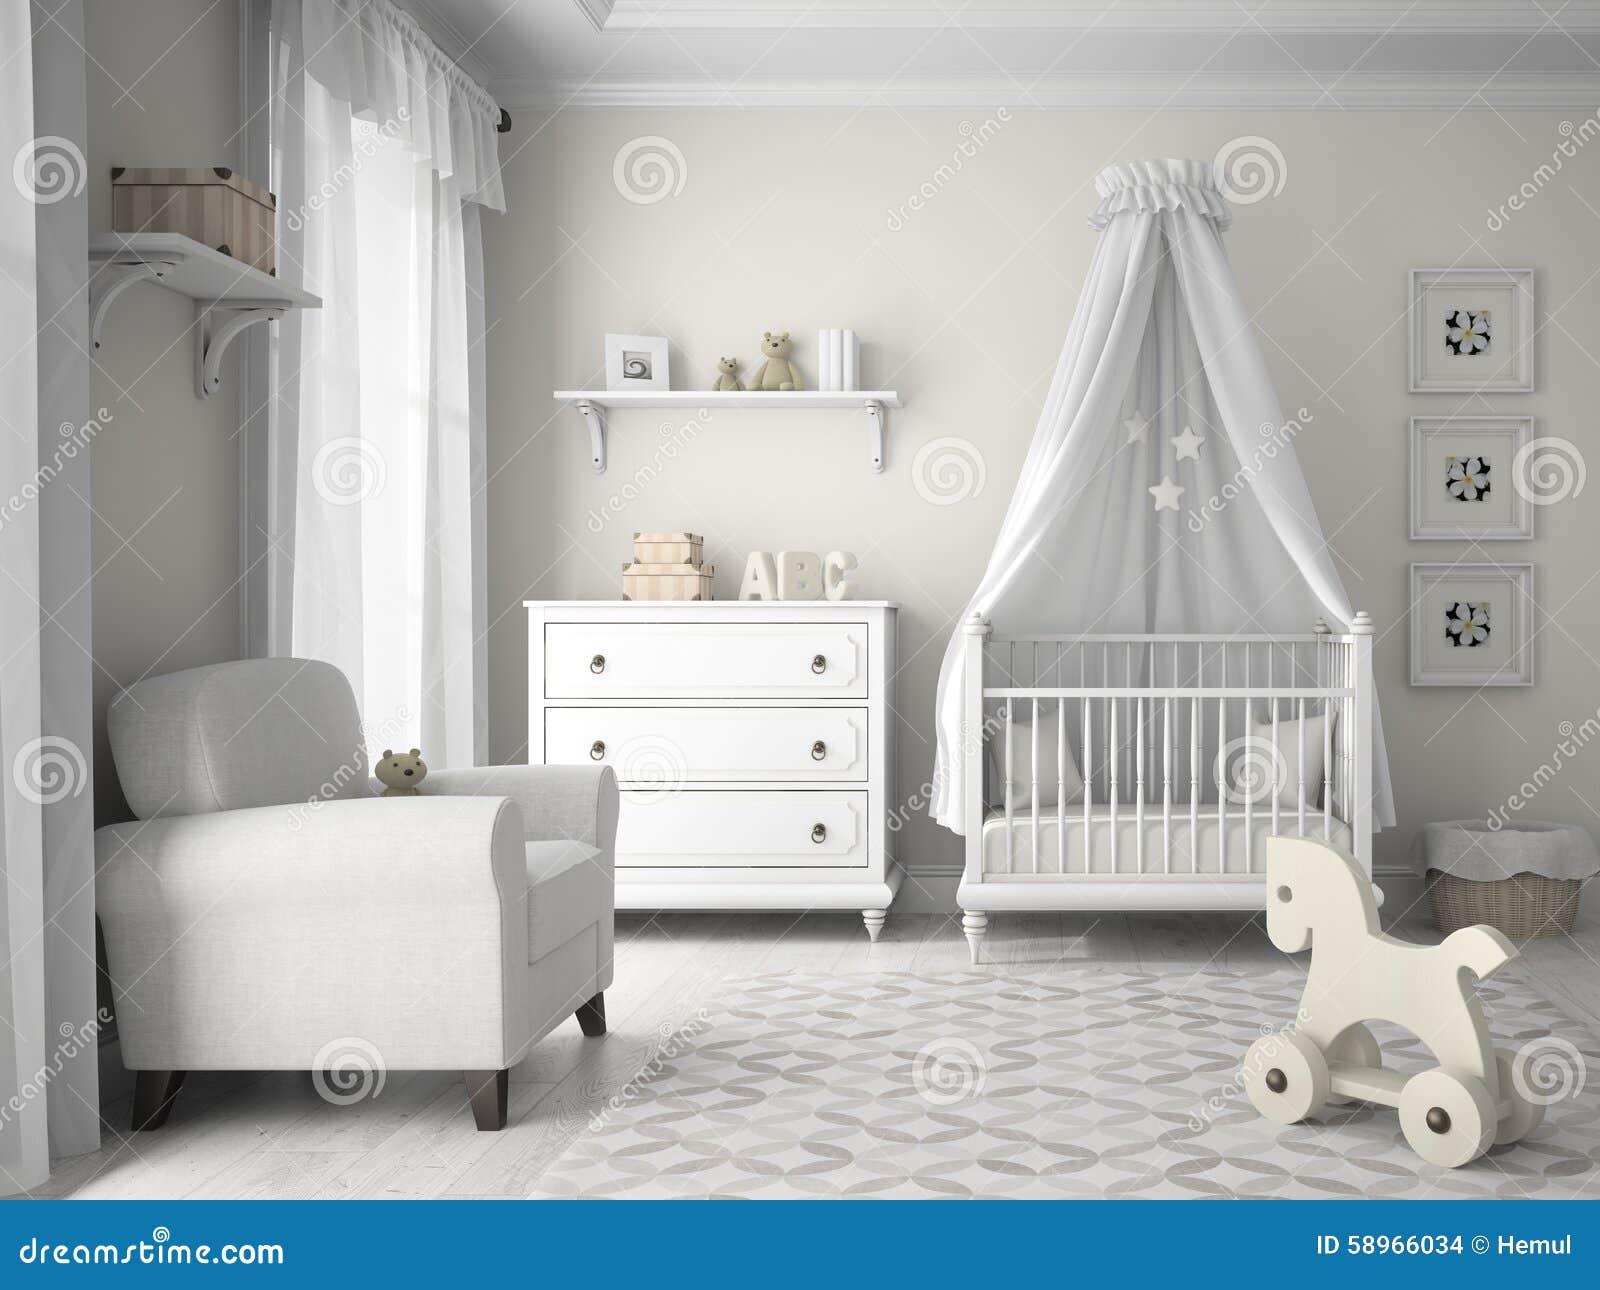 Фото детей на белом цвете